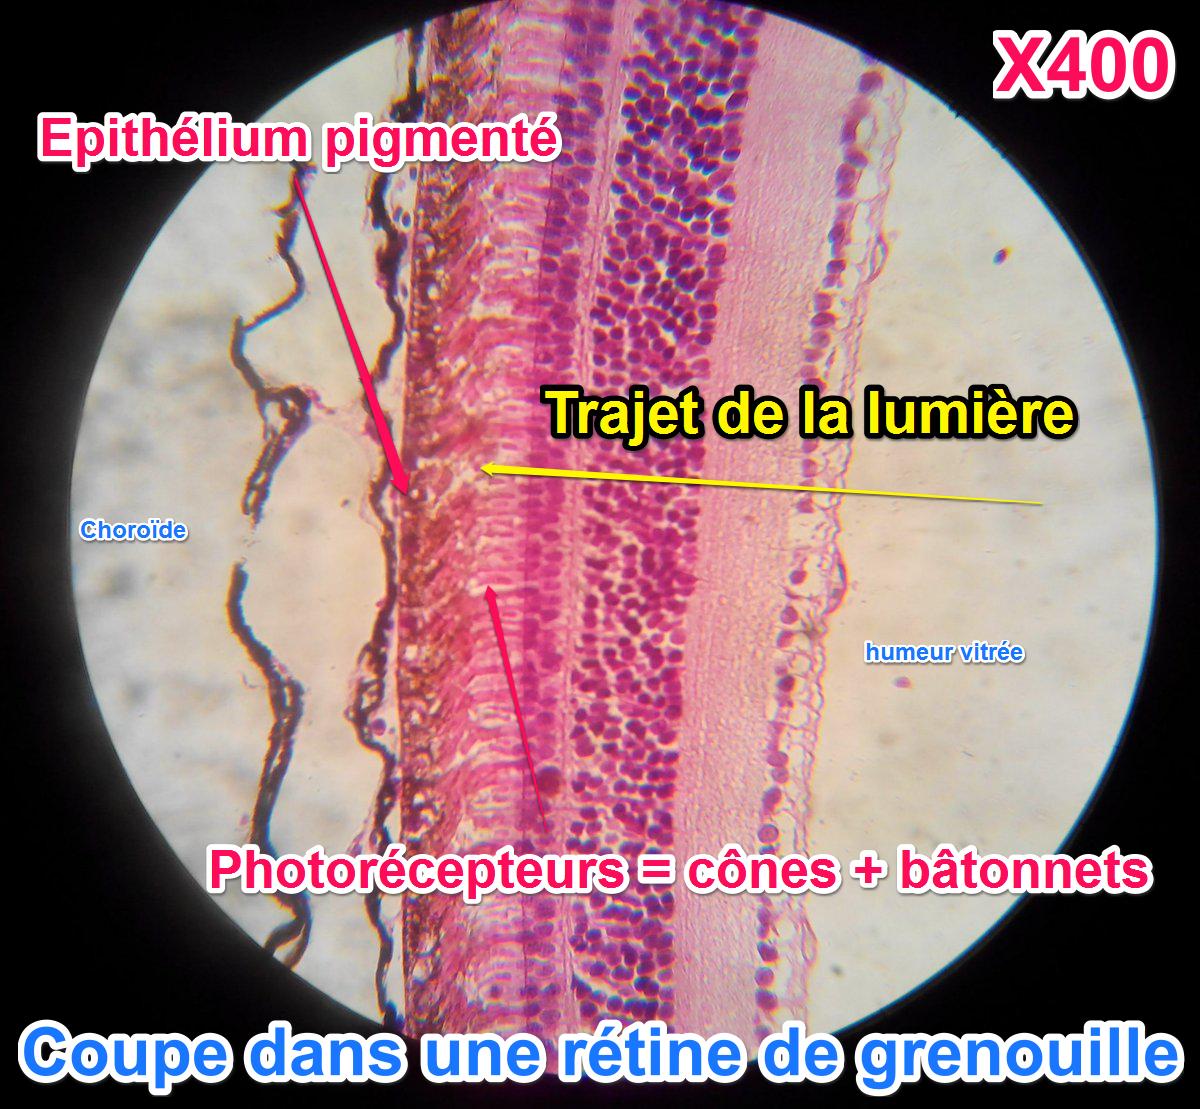 retine-organisation-cellules-batonnets-cones-photorecepteurs